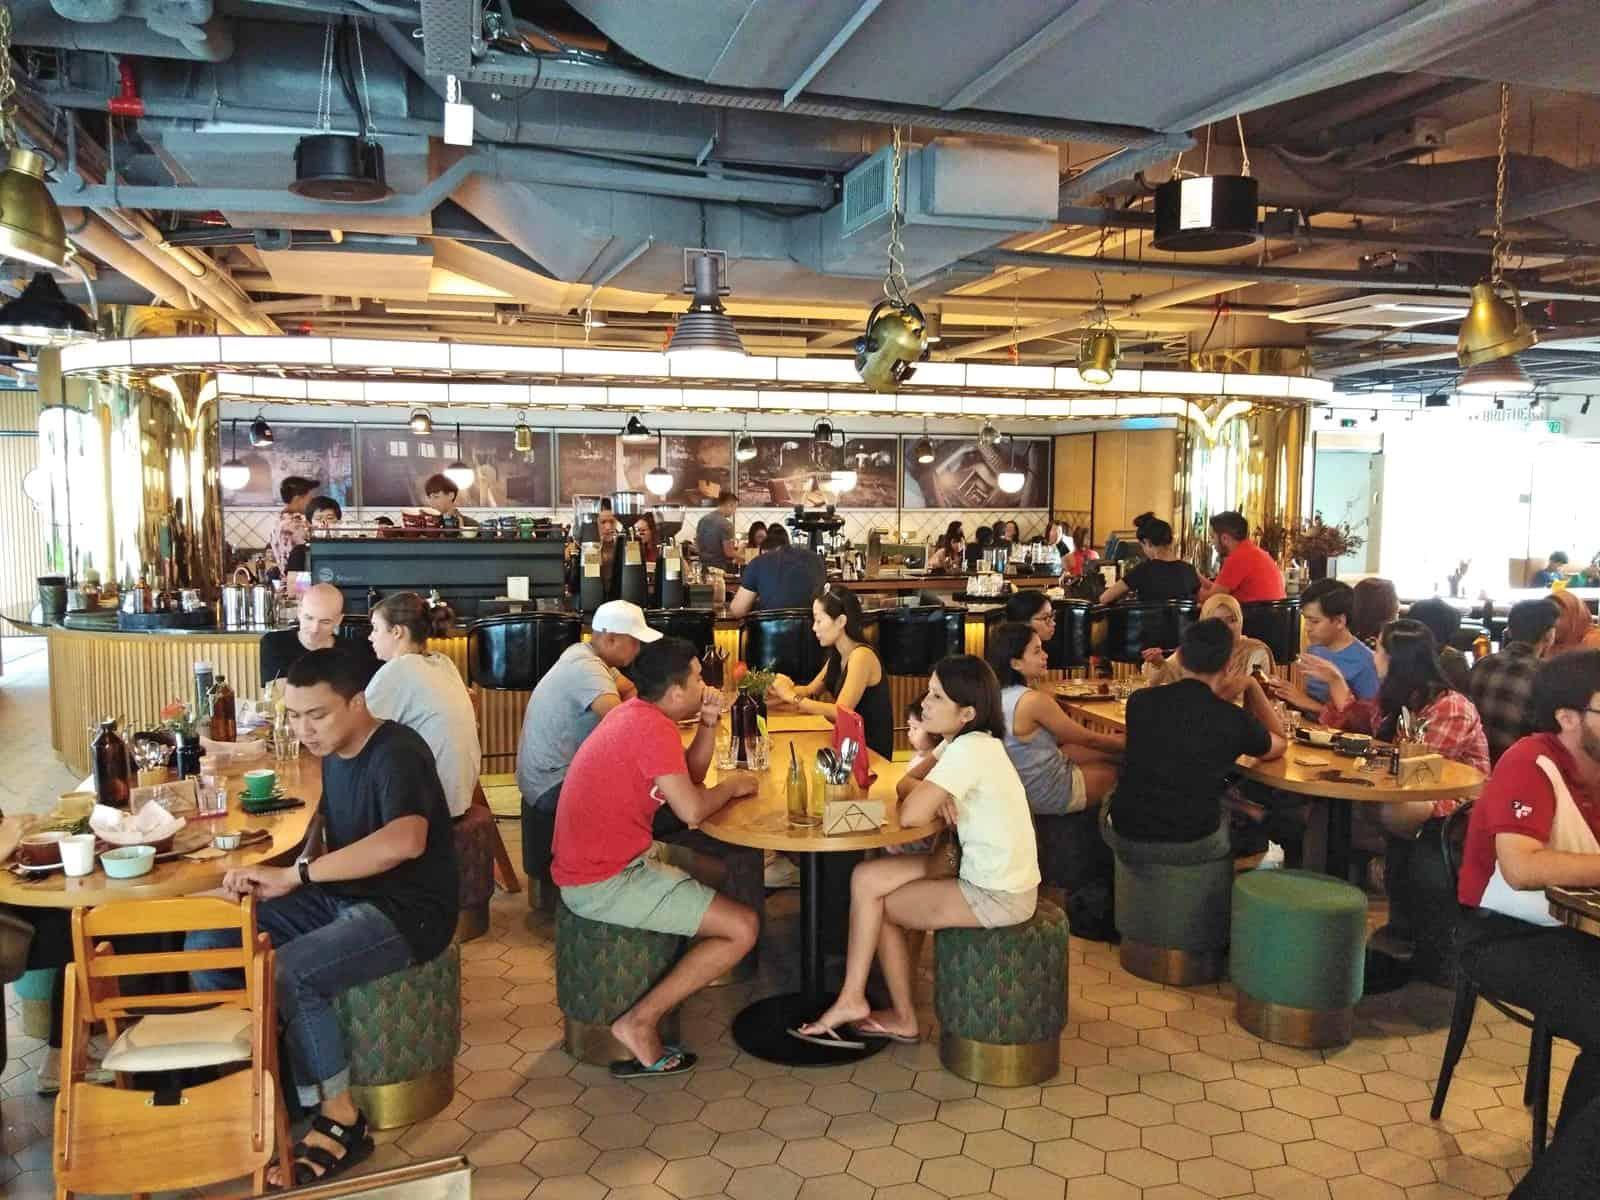 Common-Man-Coffee-Roasters-TTDI-breakfast-lunch-restaurant-Kuala-Lumpur-Malaysia-Travel-Mermaid-03